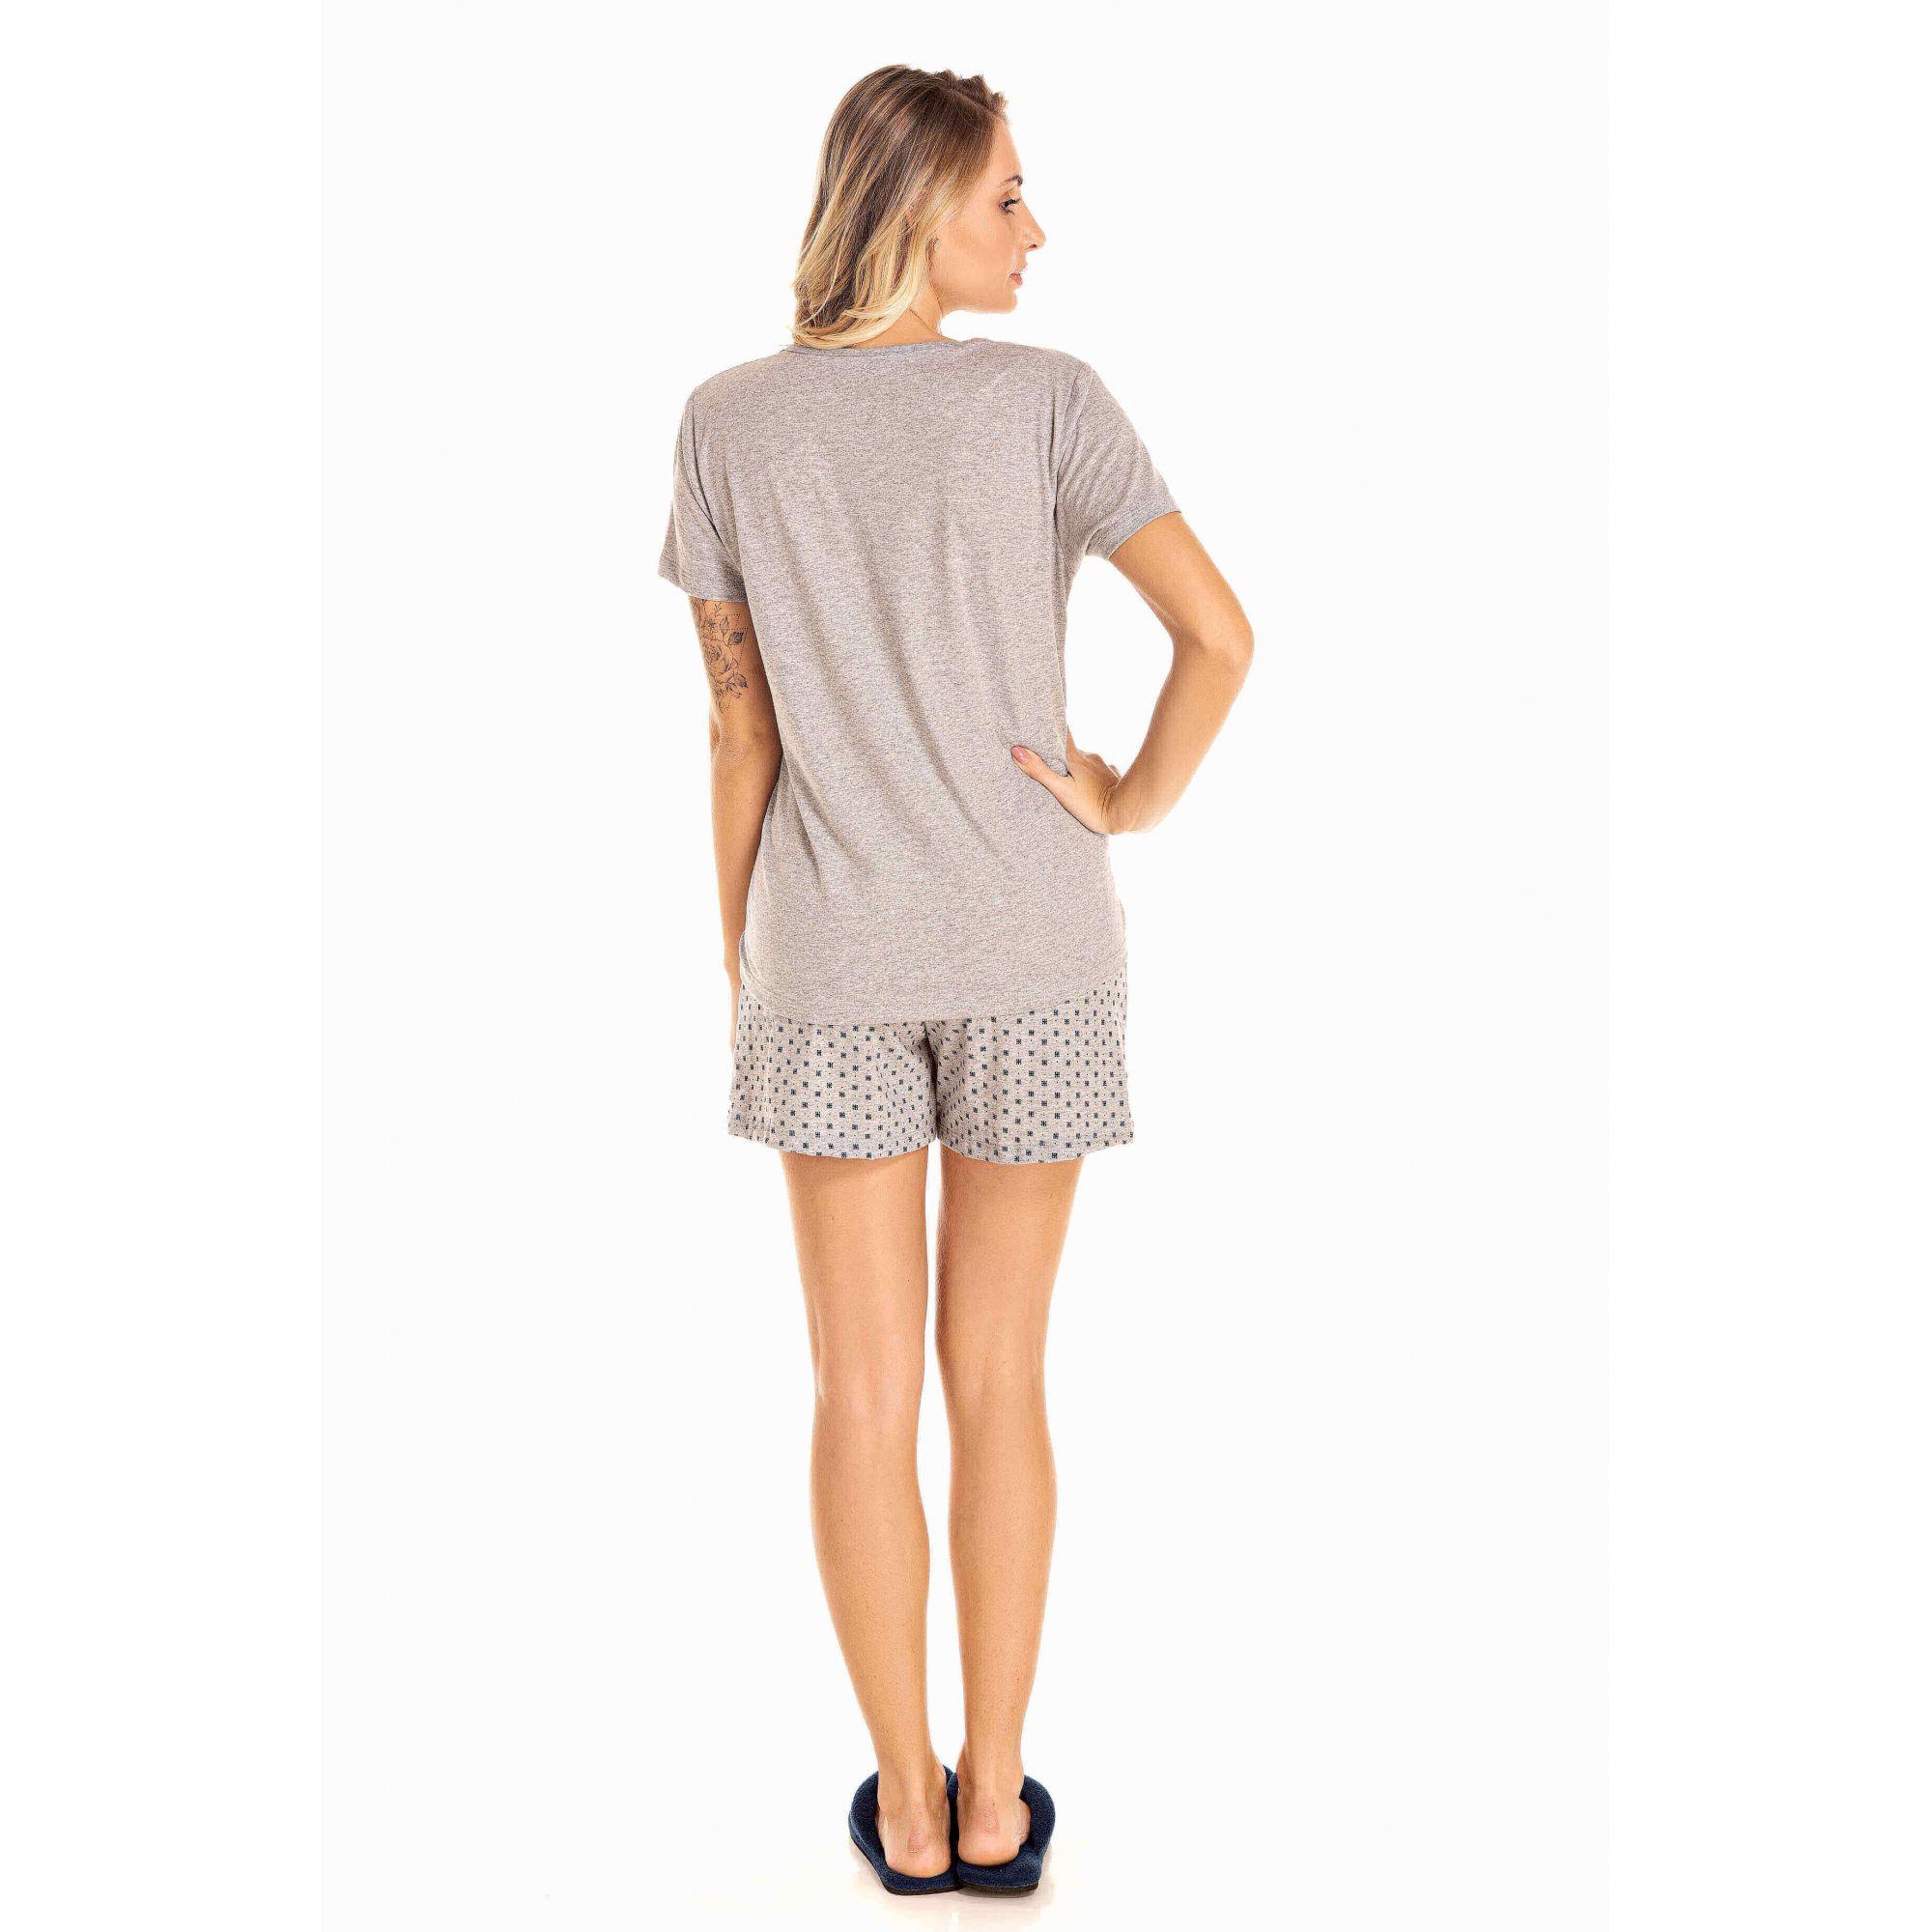 111/E - Short Doll Adulto Feminino Decote V Foil - Mescla